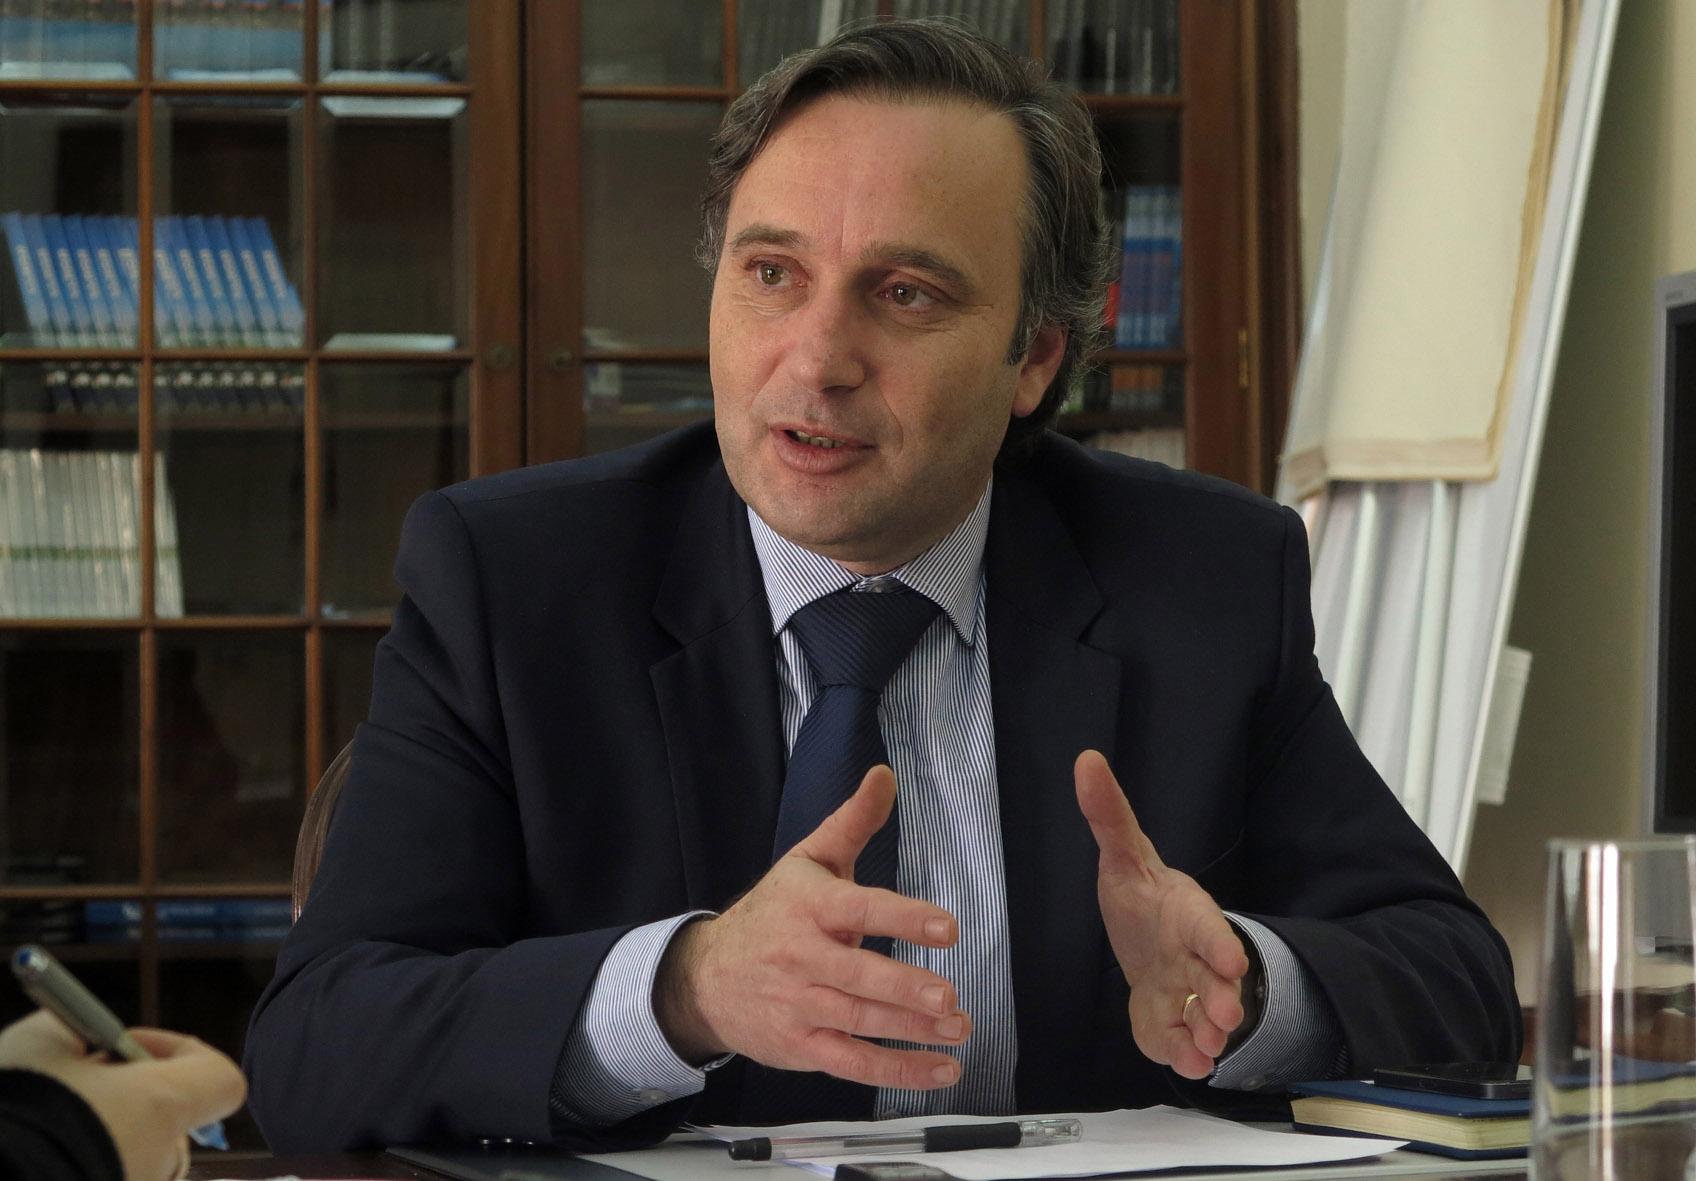 Número de beneficiários dos apoios ao consumidor de energia subiu mais de 81% em 2015, revela Vítor Fraga